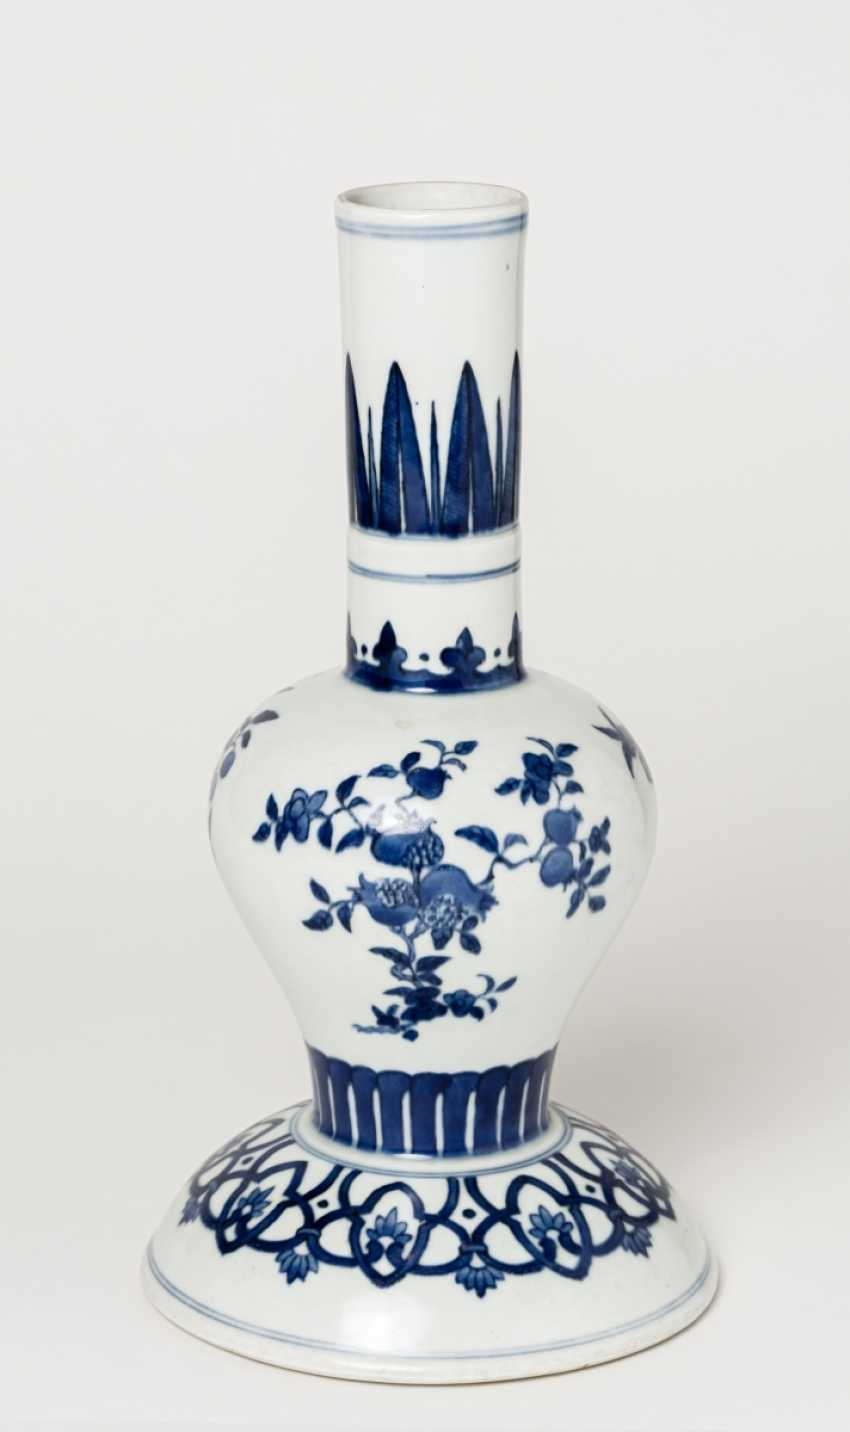 BLUE AND WHITE FLOWER VASE - photo 1